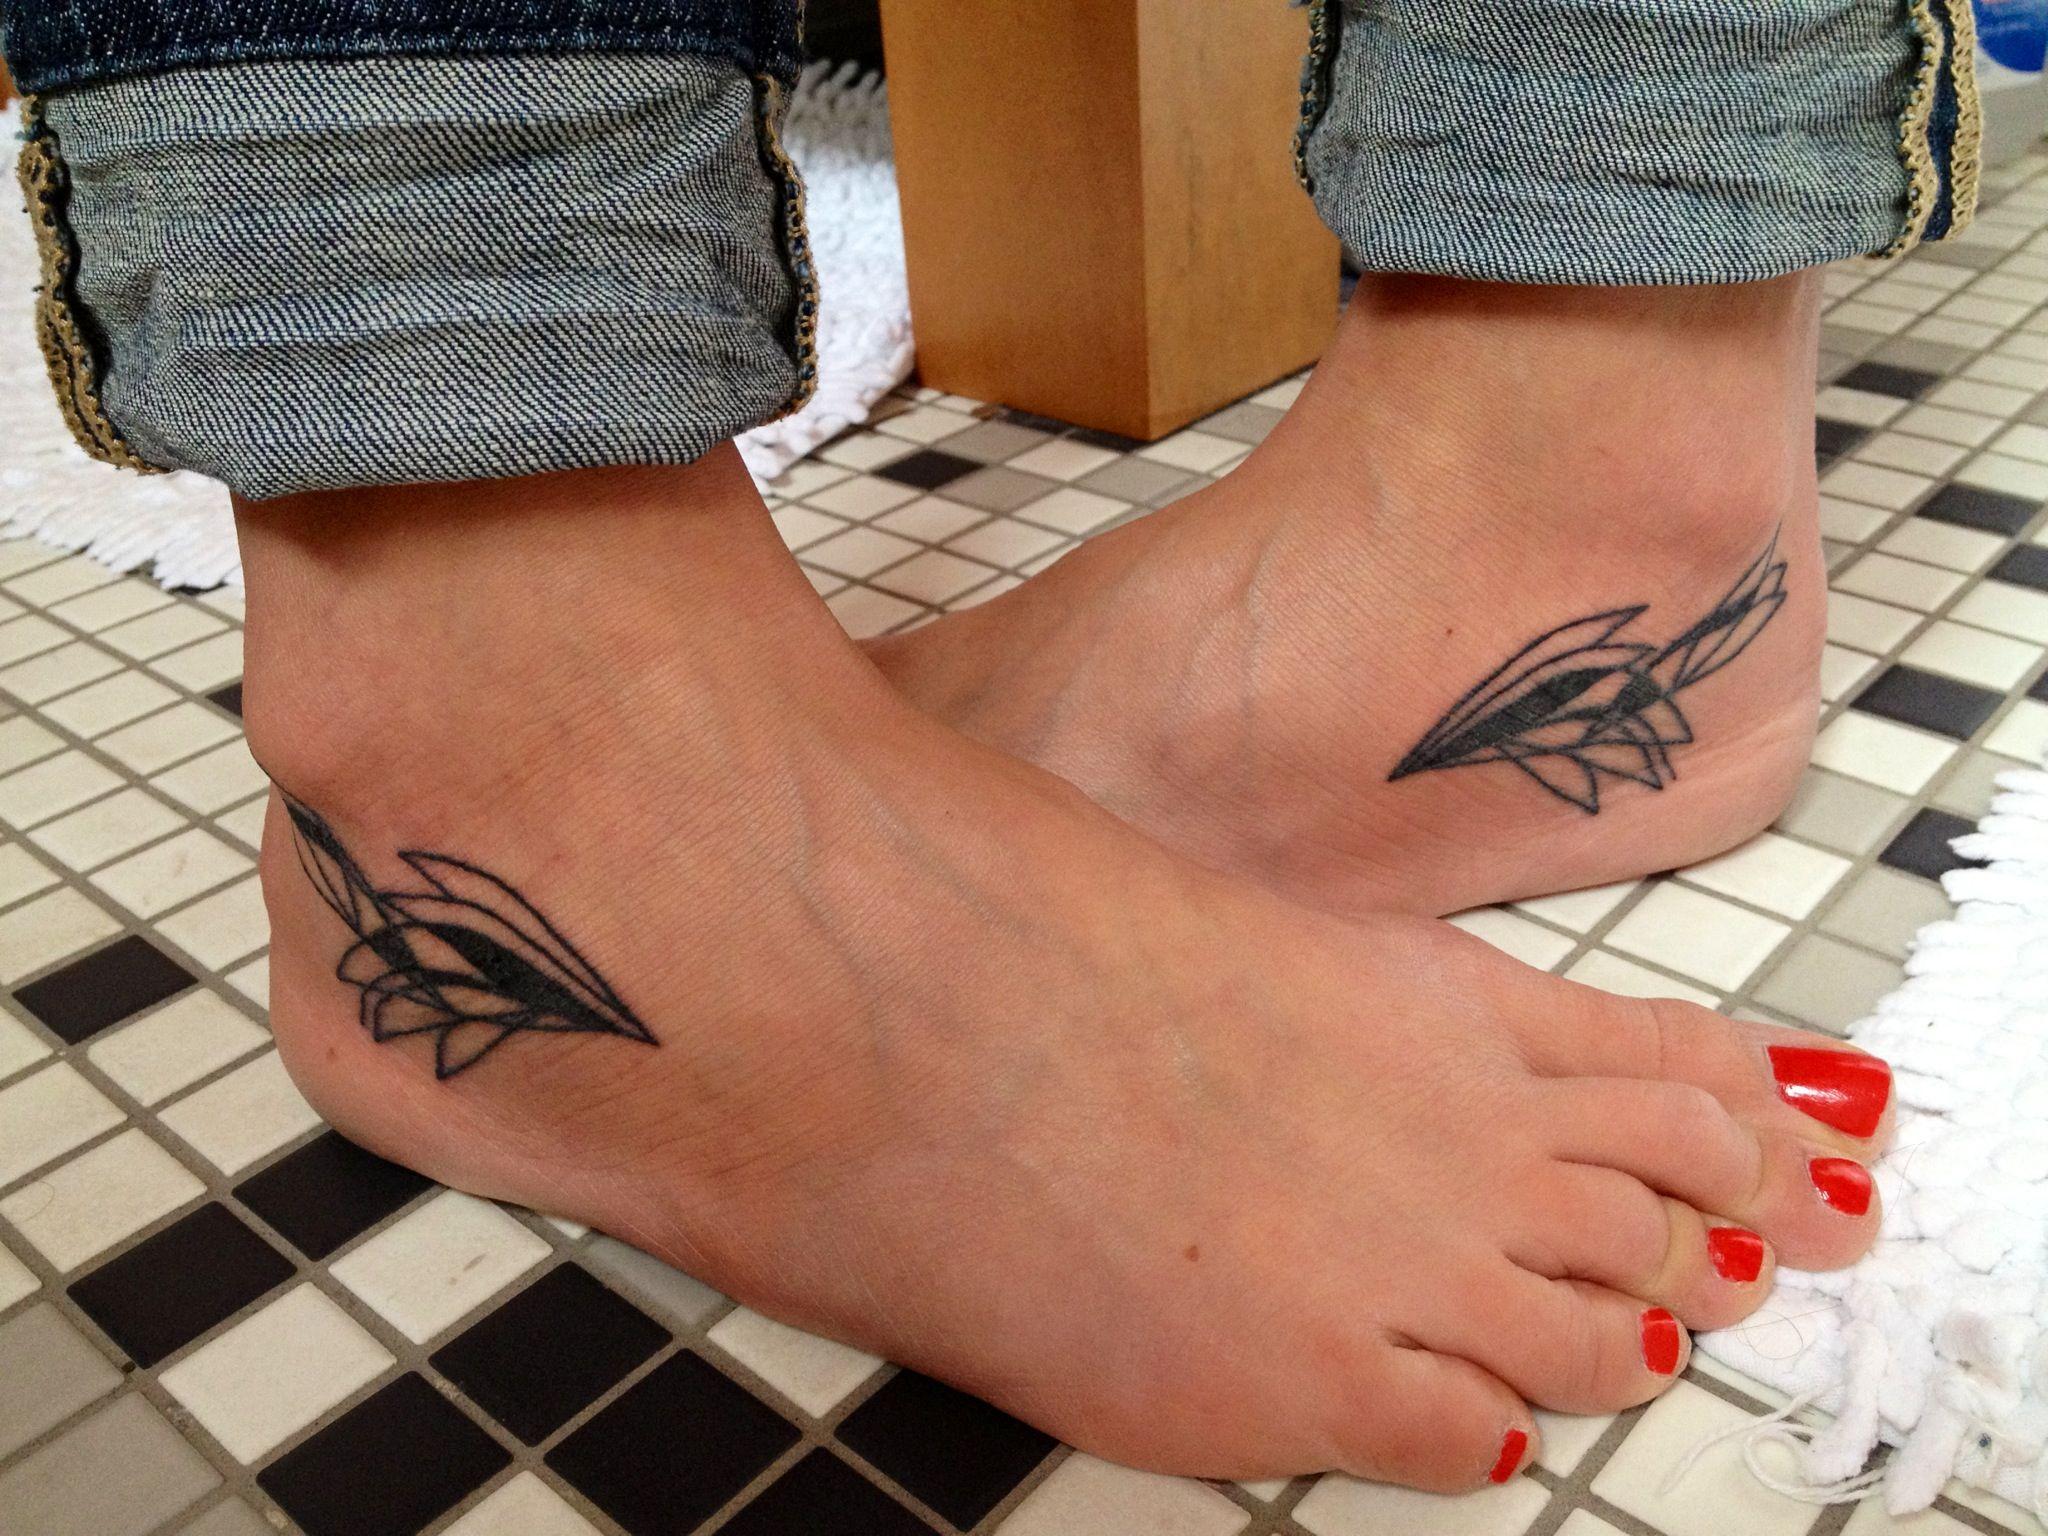 hermes wing tattoo winged foot running tattoos charley harper inspired bird wings tattooed feet. Black Bedroom Furniture Sets. Home Design Ideas